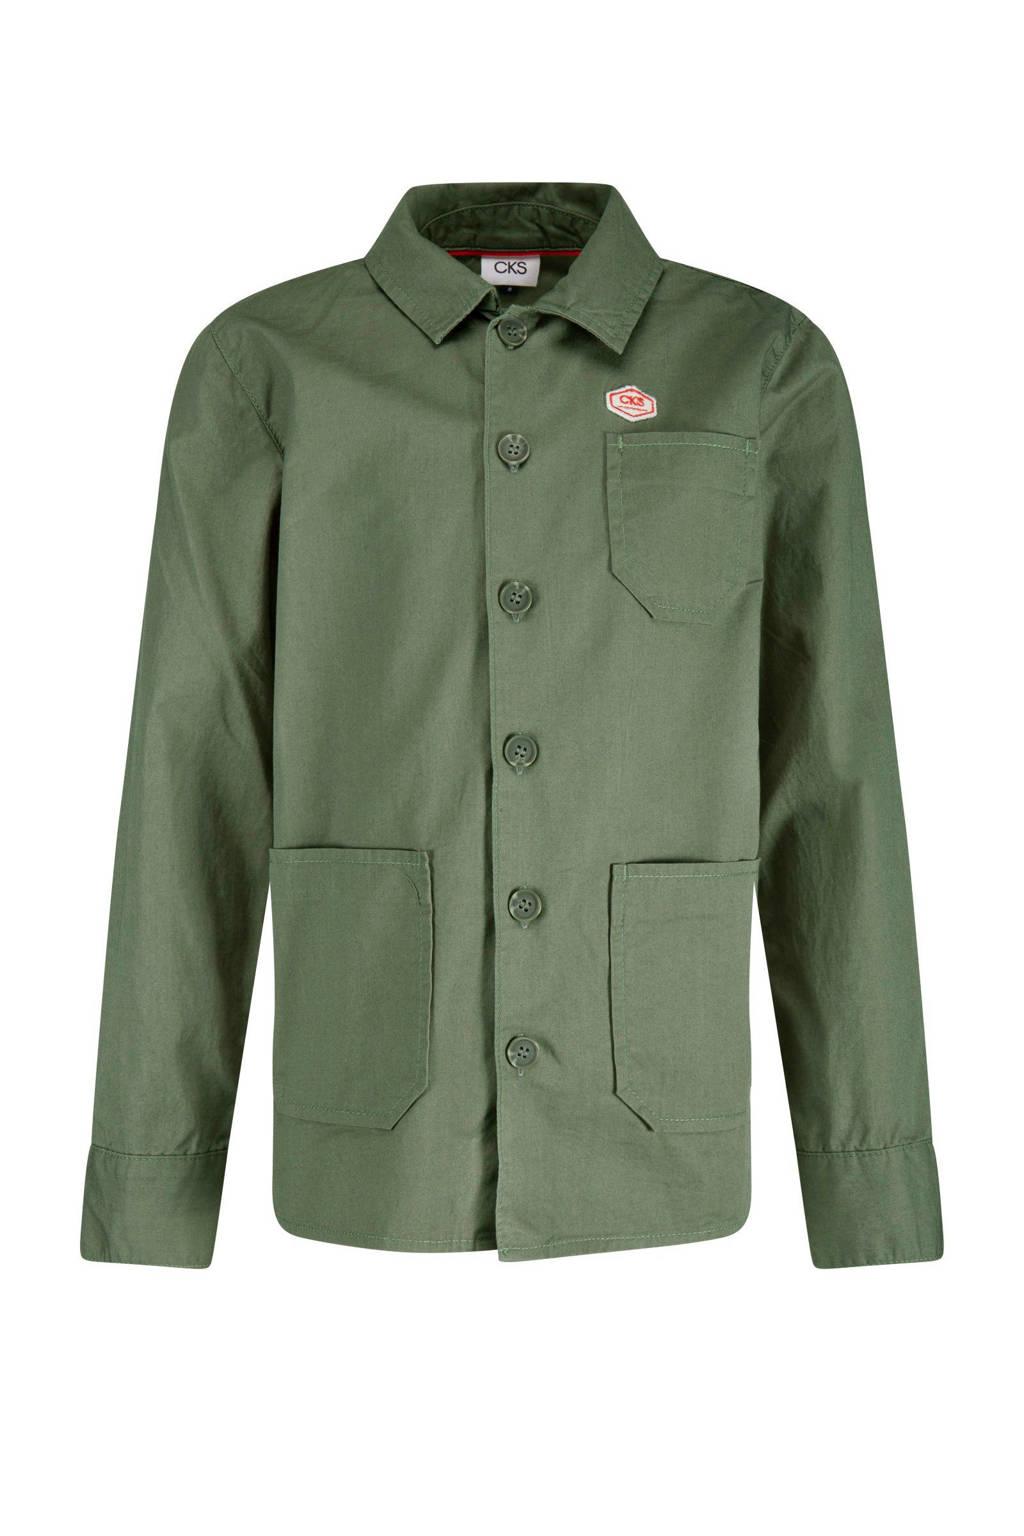 CKS KIDS overhemd Yabot khaki groen, Khaki groen